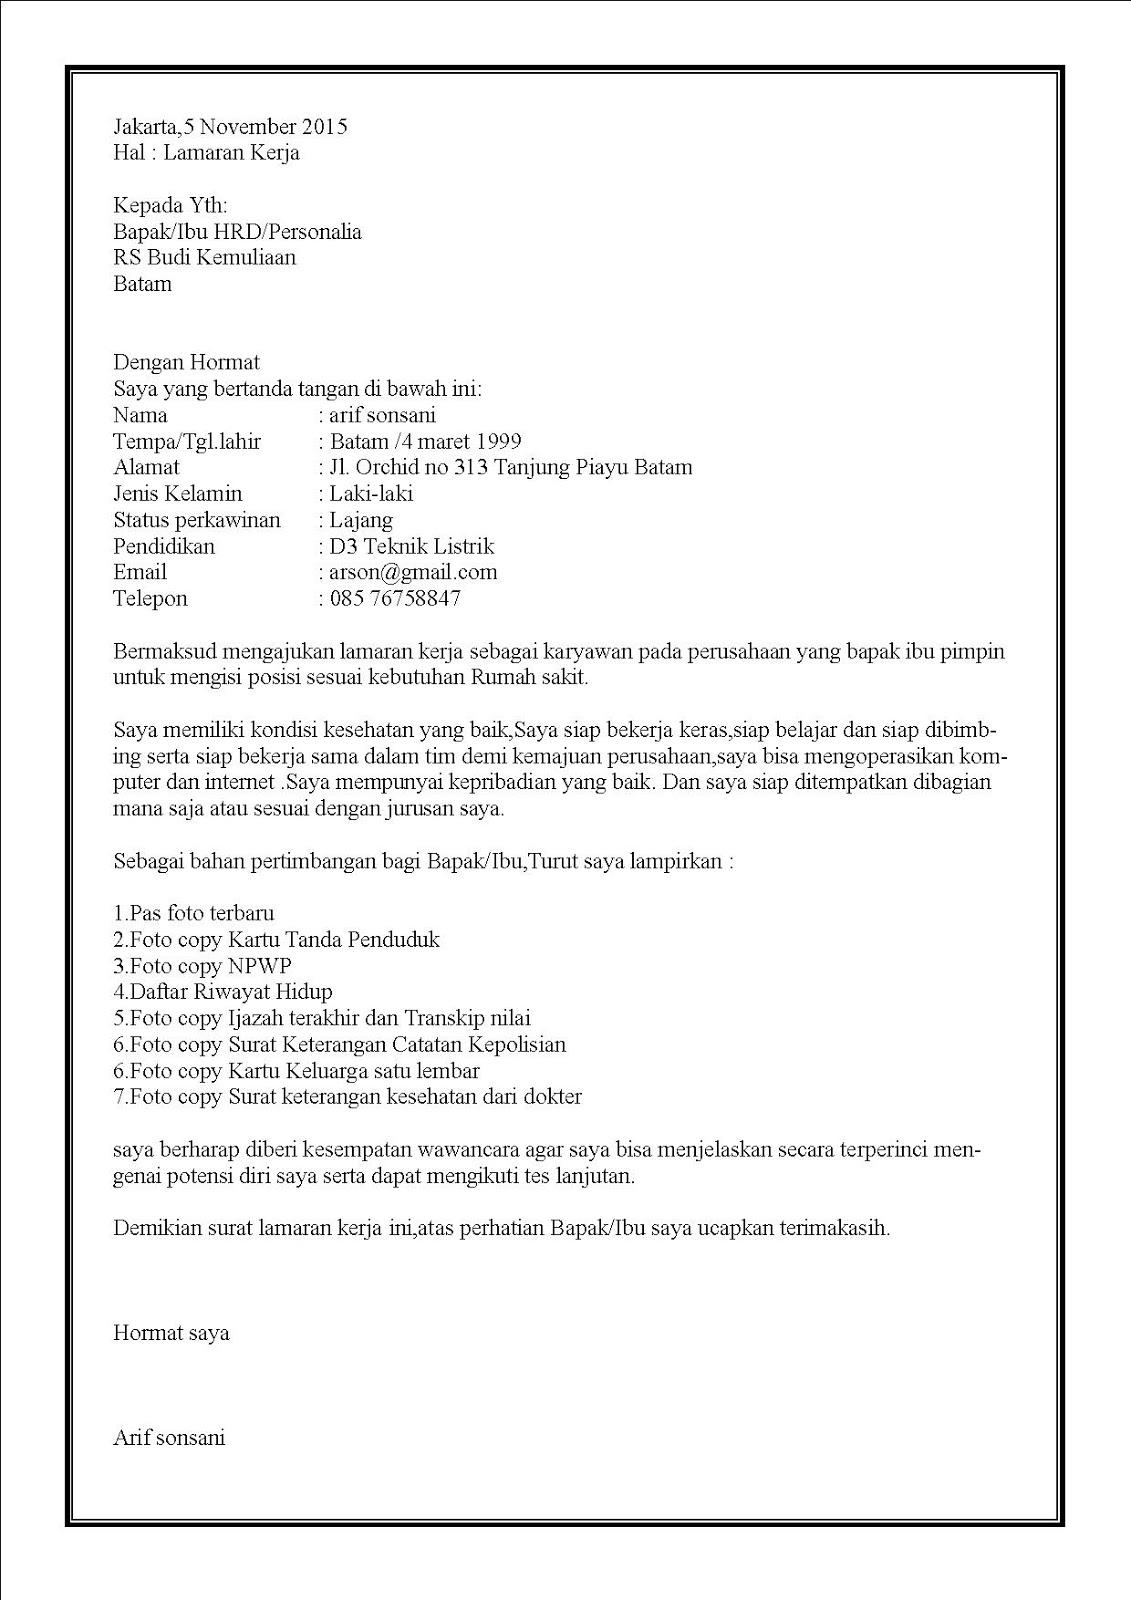 Contoh surat lamaran kerja di rumah sakit inisiatif sendiri